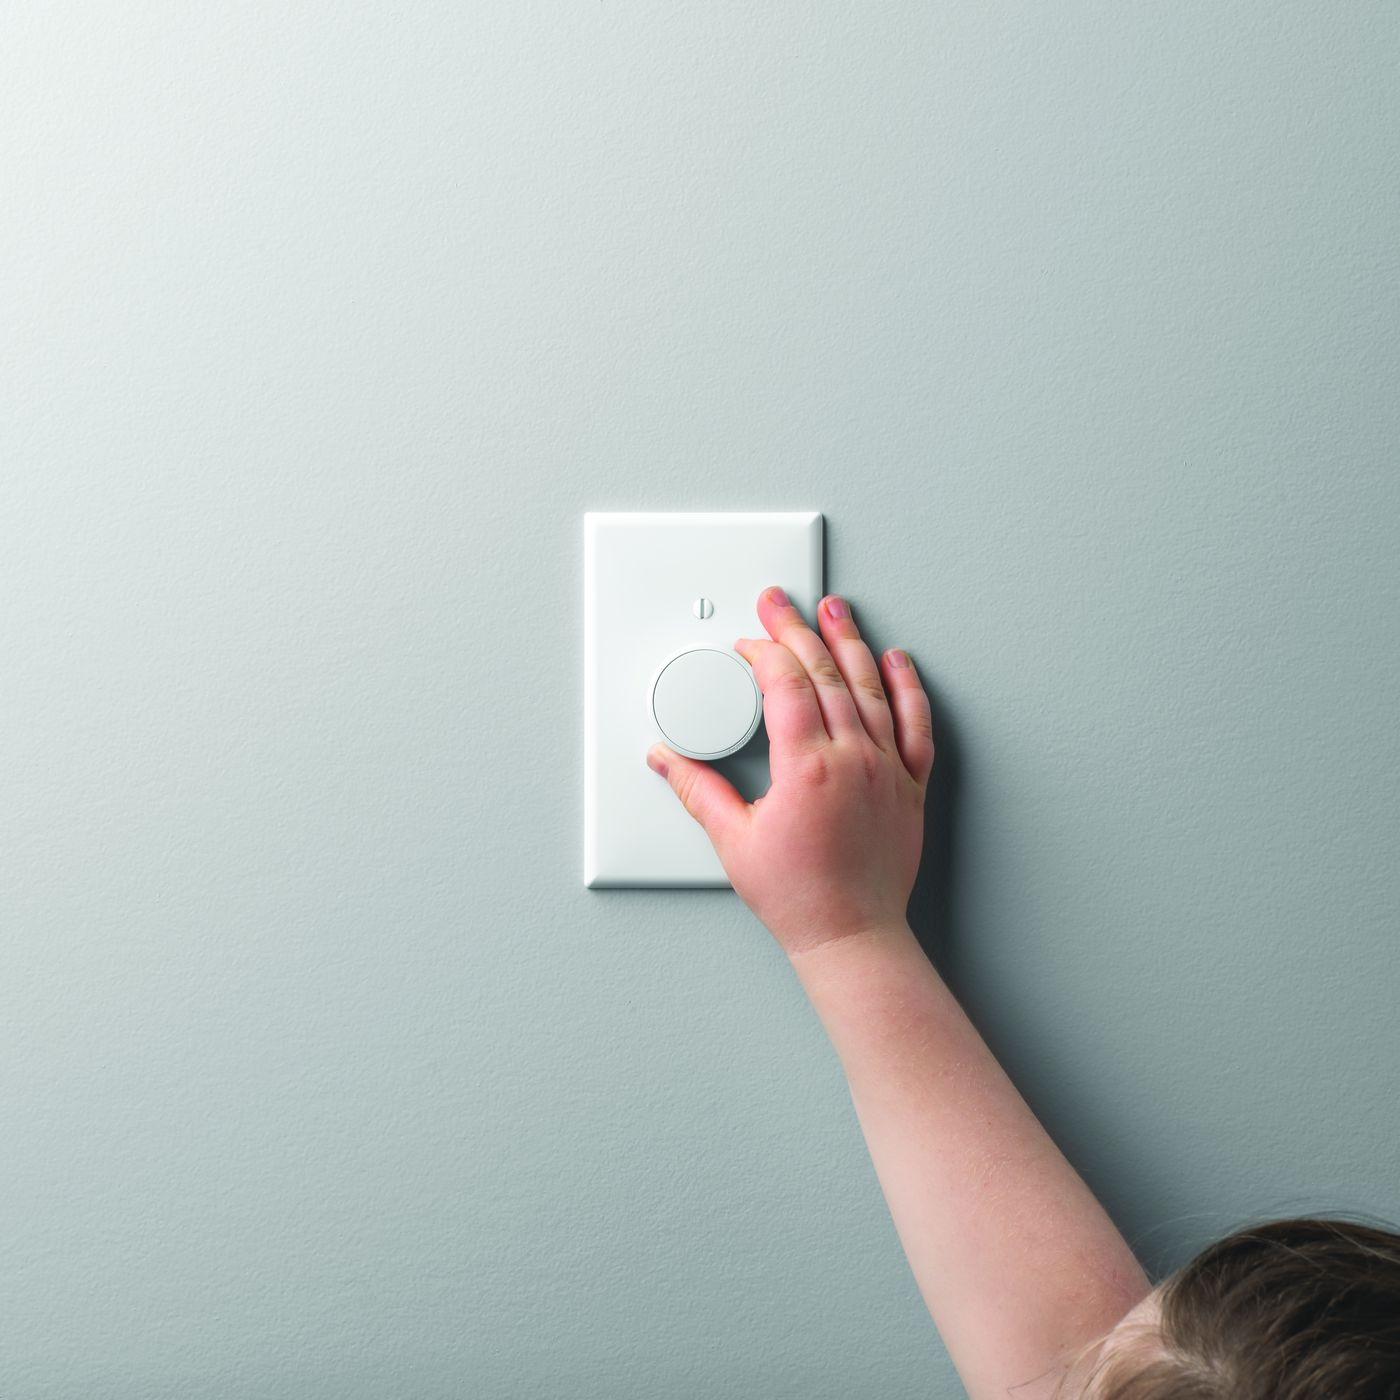 Hue Lights Fi The Wall Switch